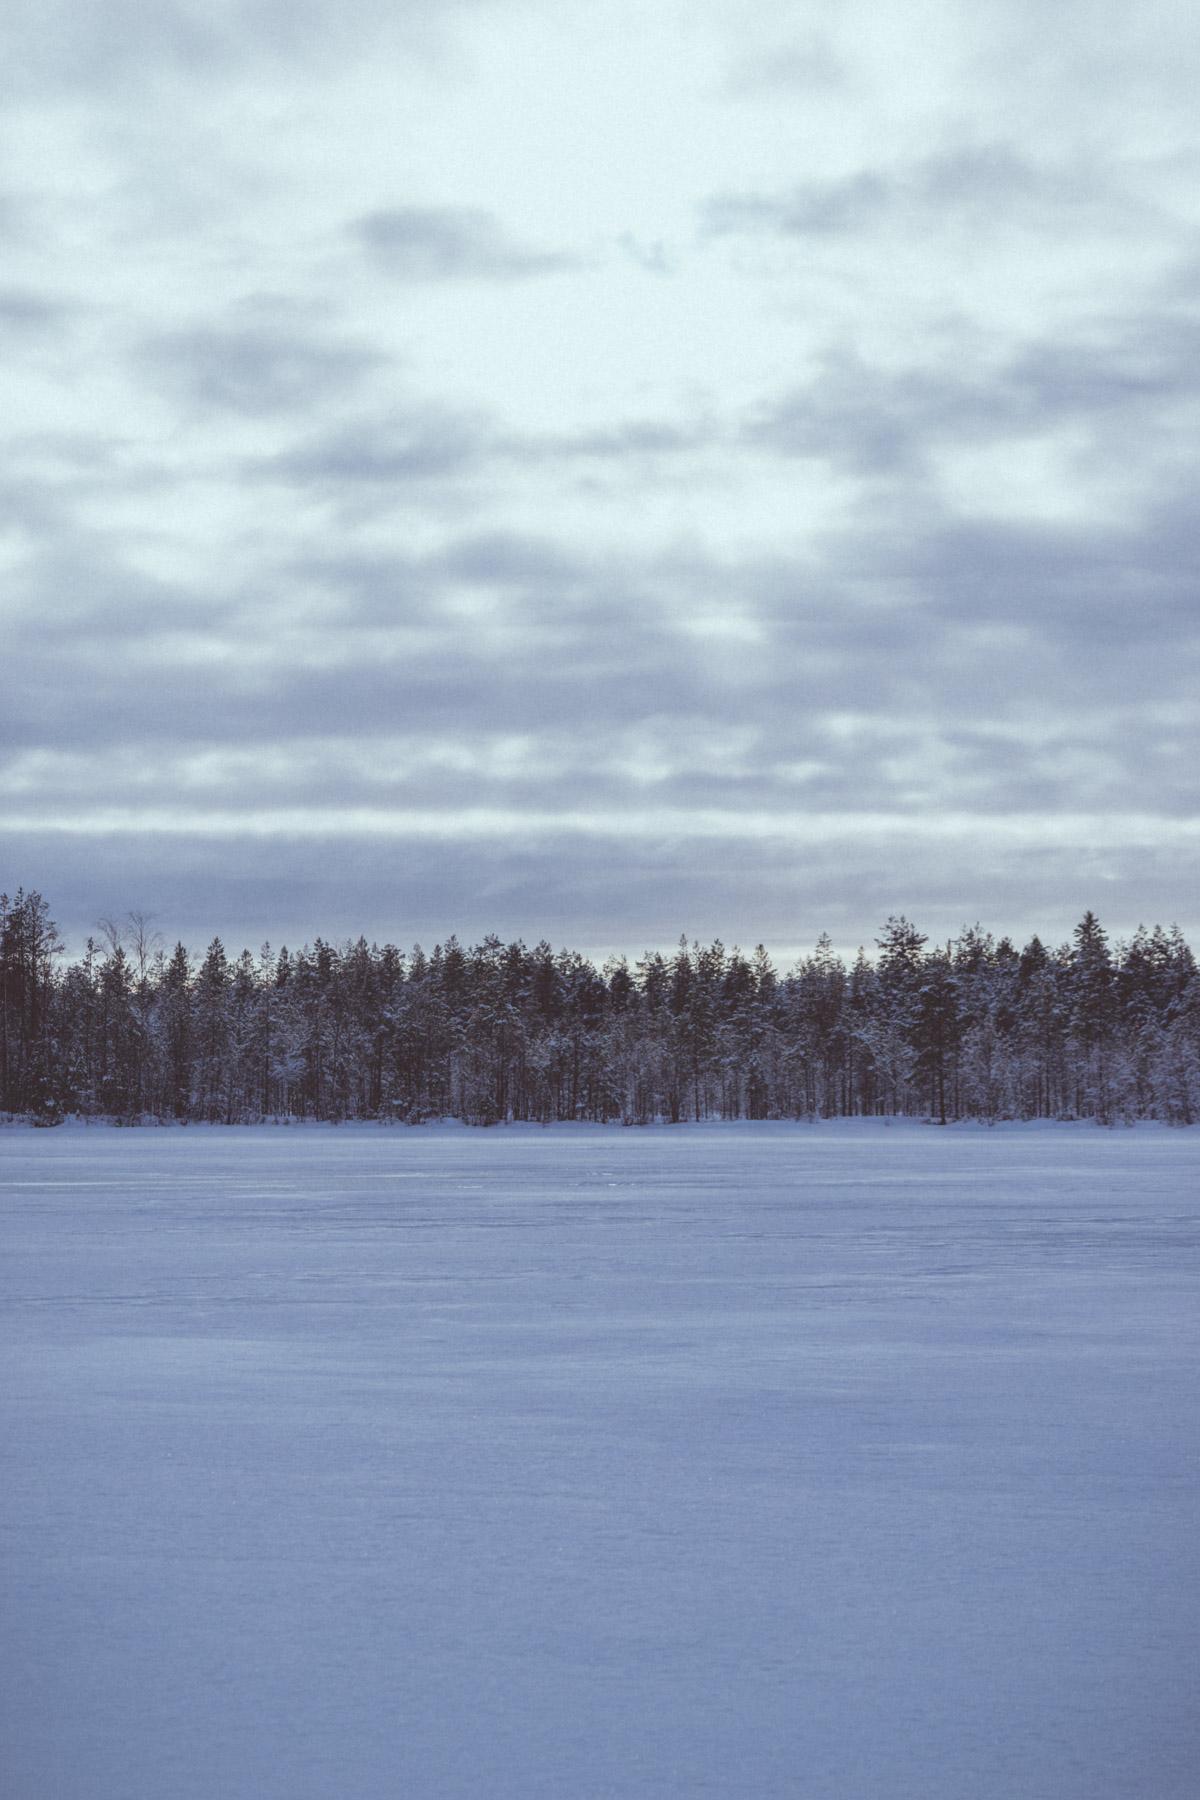 Winter Forest in Yli-Ii